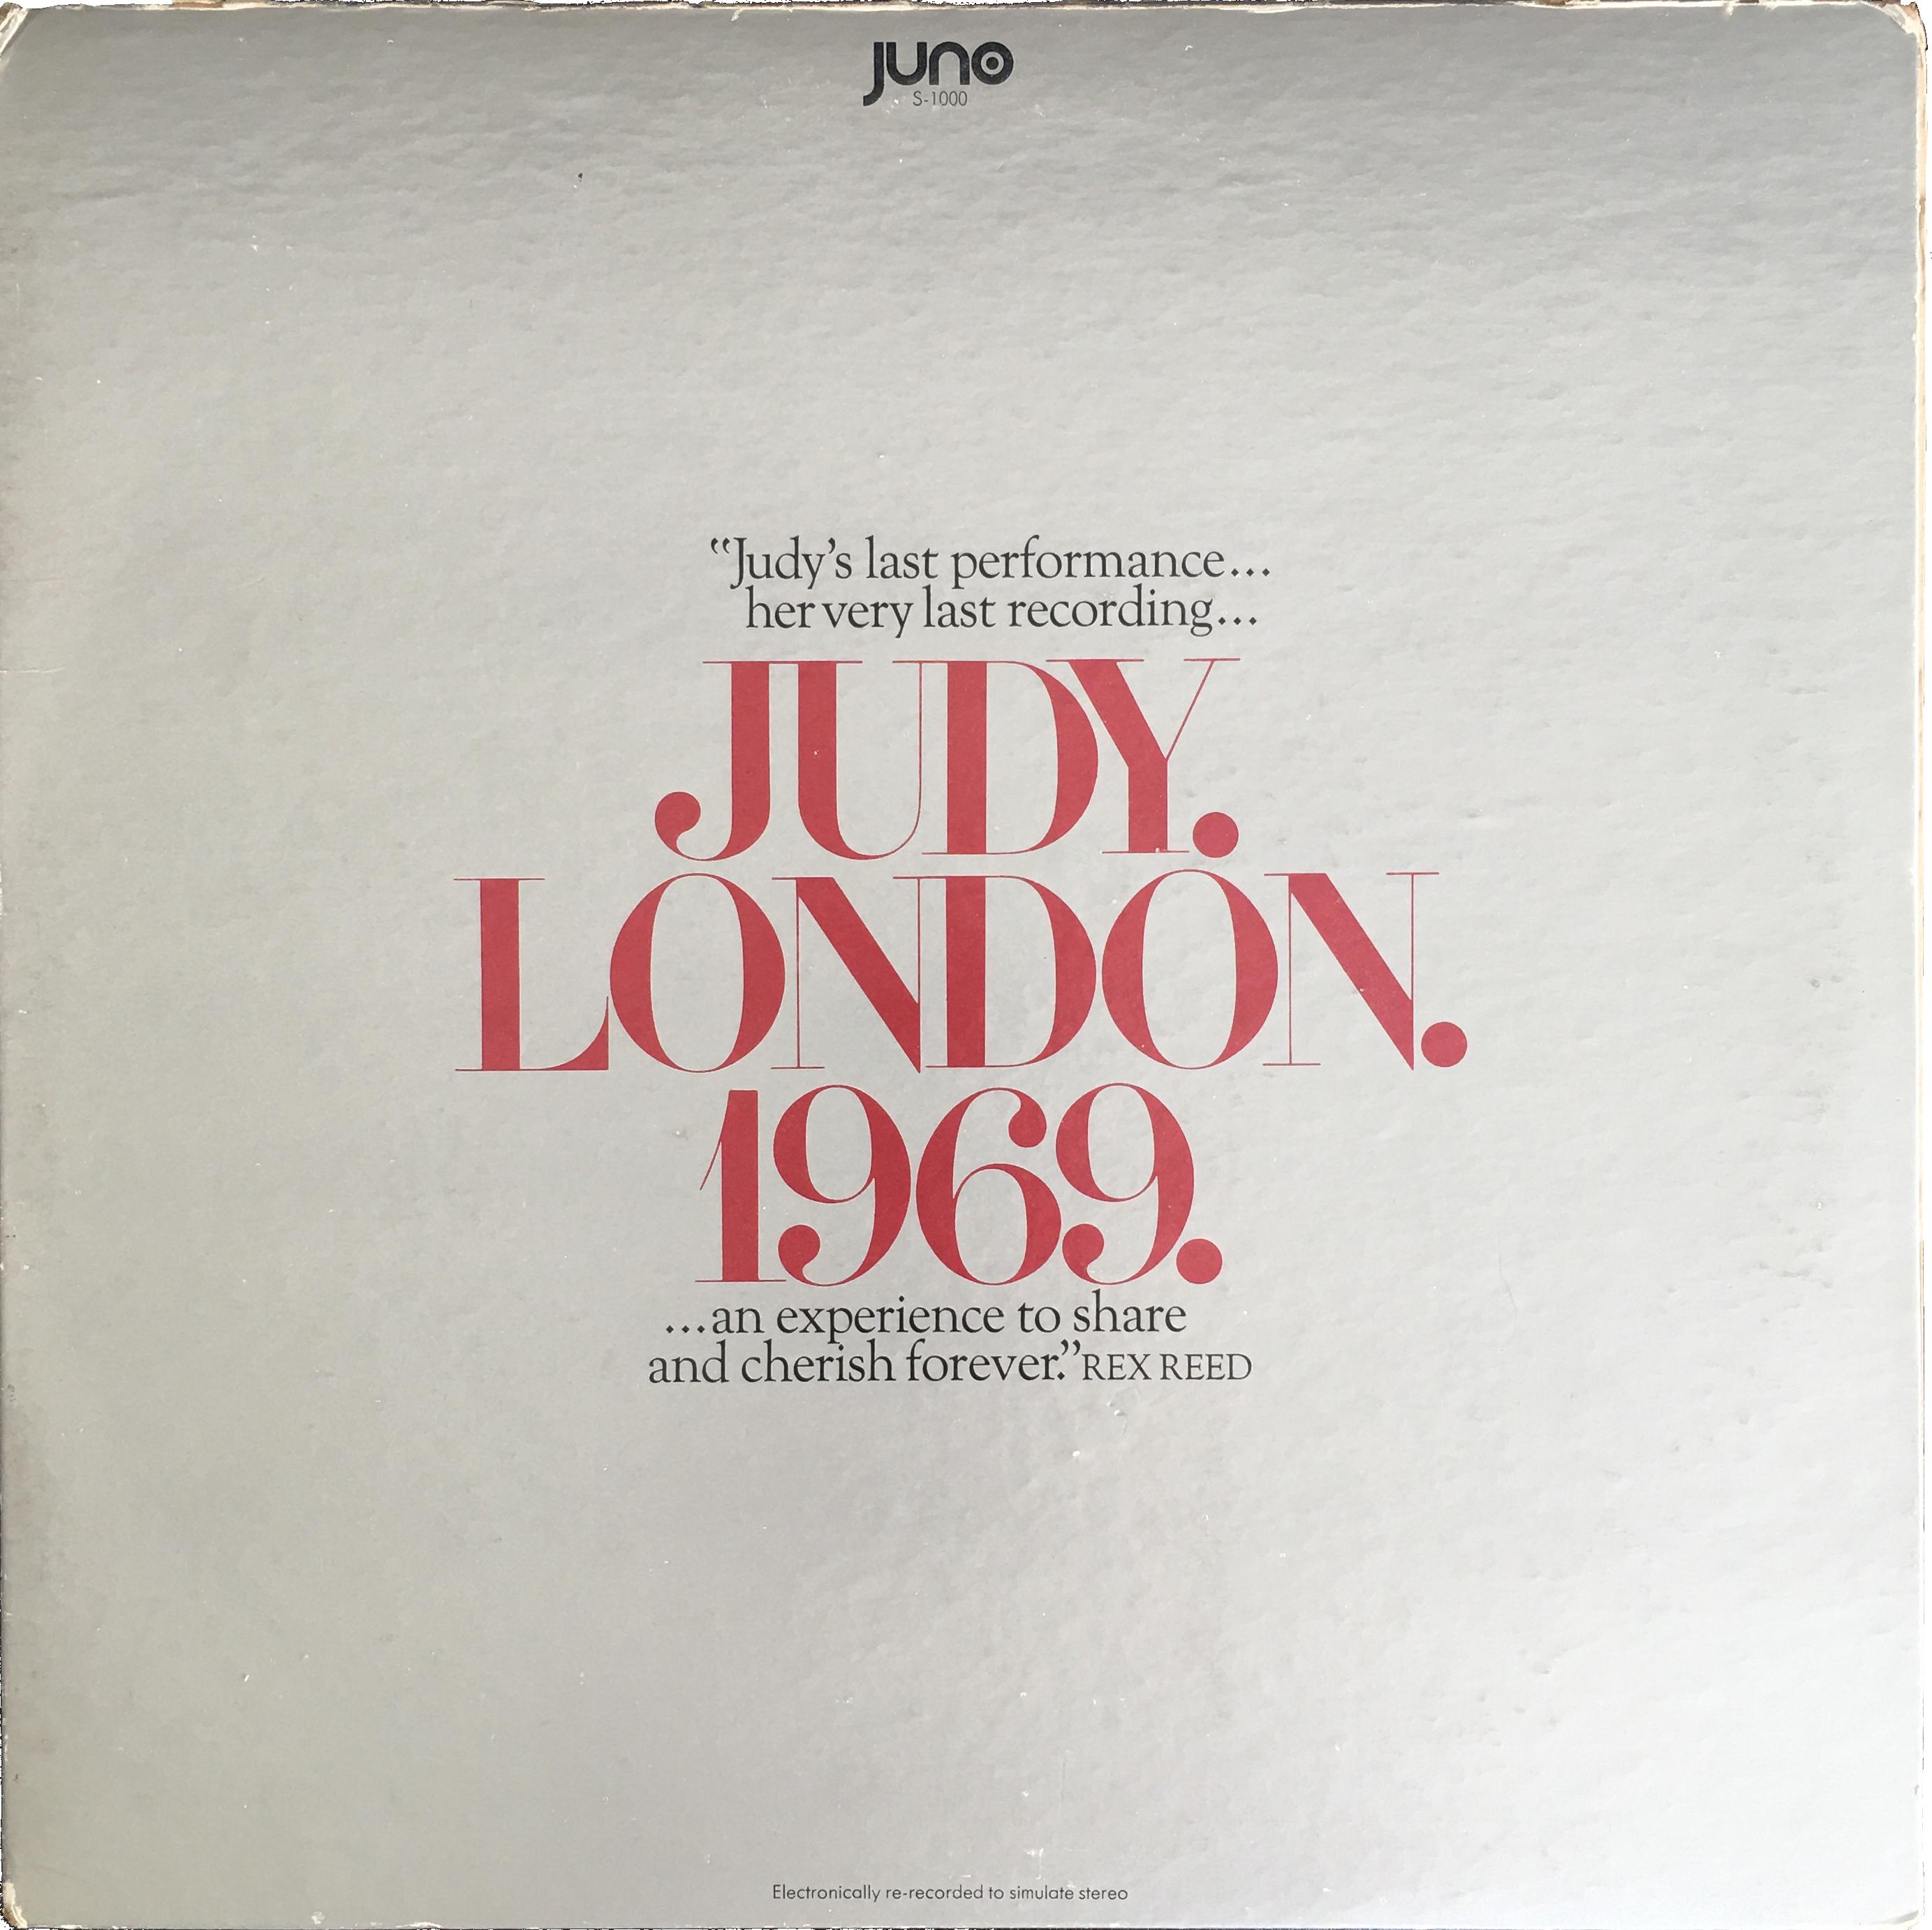 Judy.London.1969. album